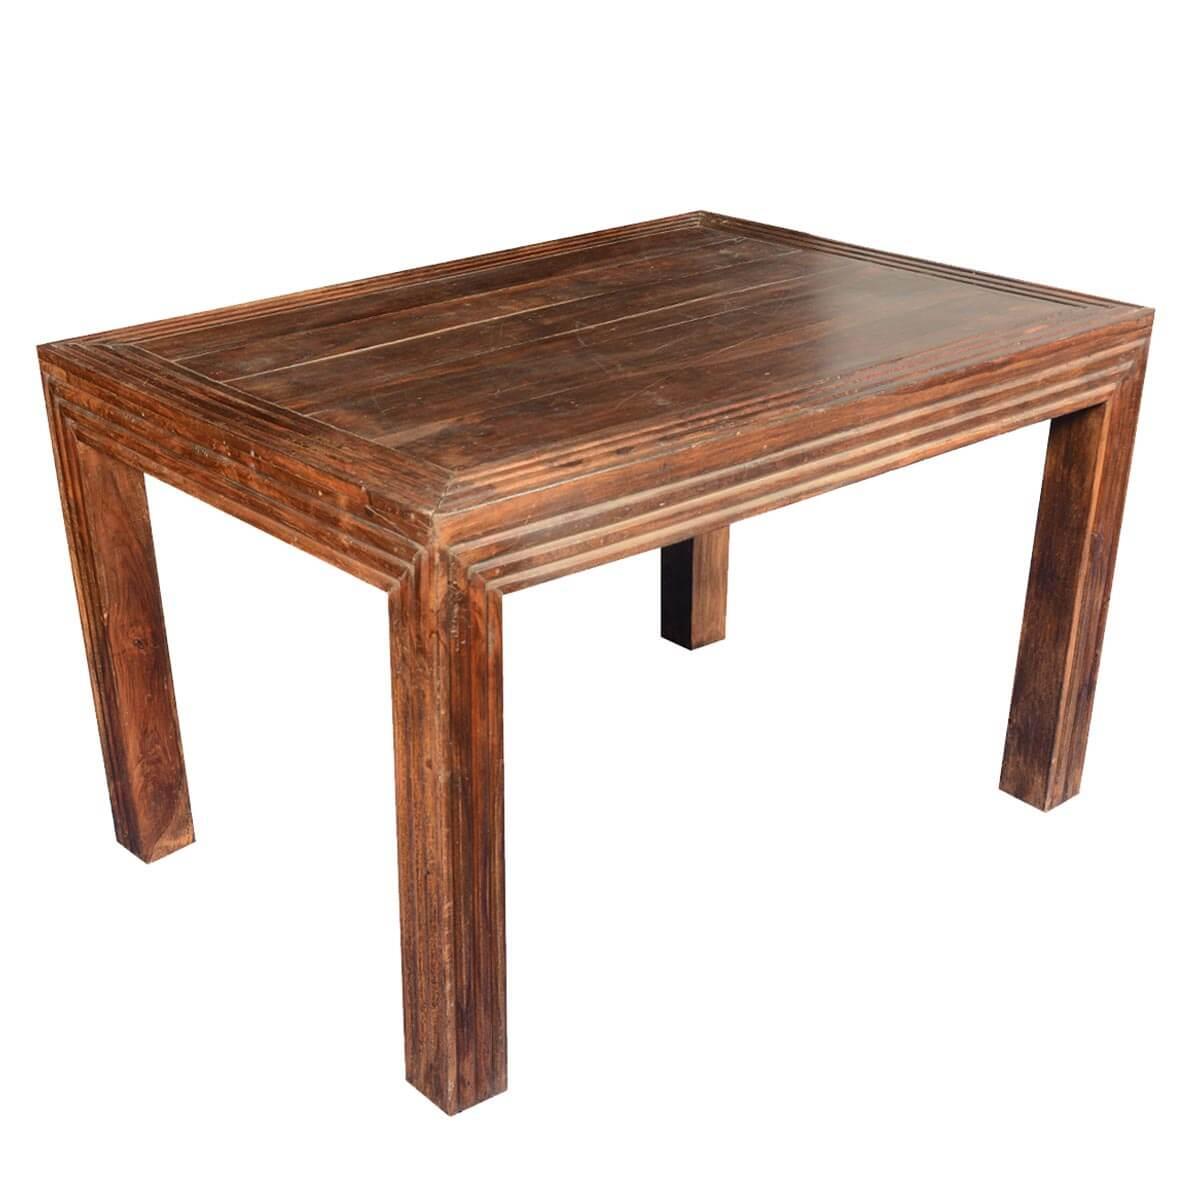 sierra rustic handcrafted mango wood dining table. Black Bedroom Furniture Sets. Home Design Ideas